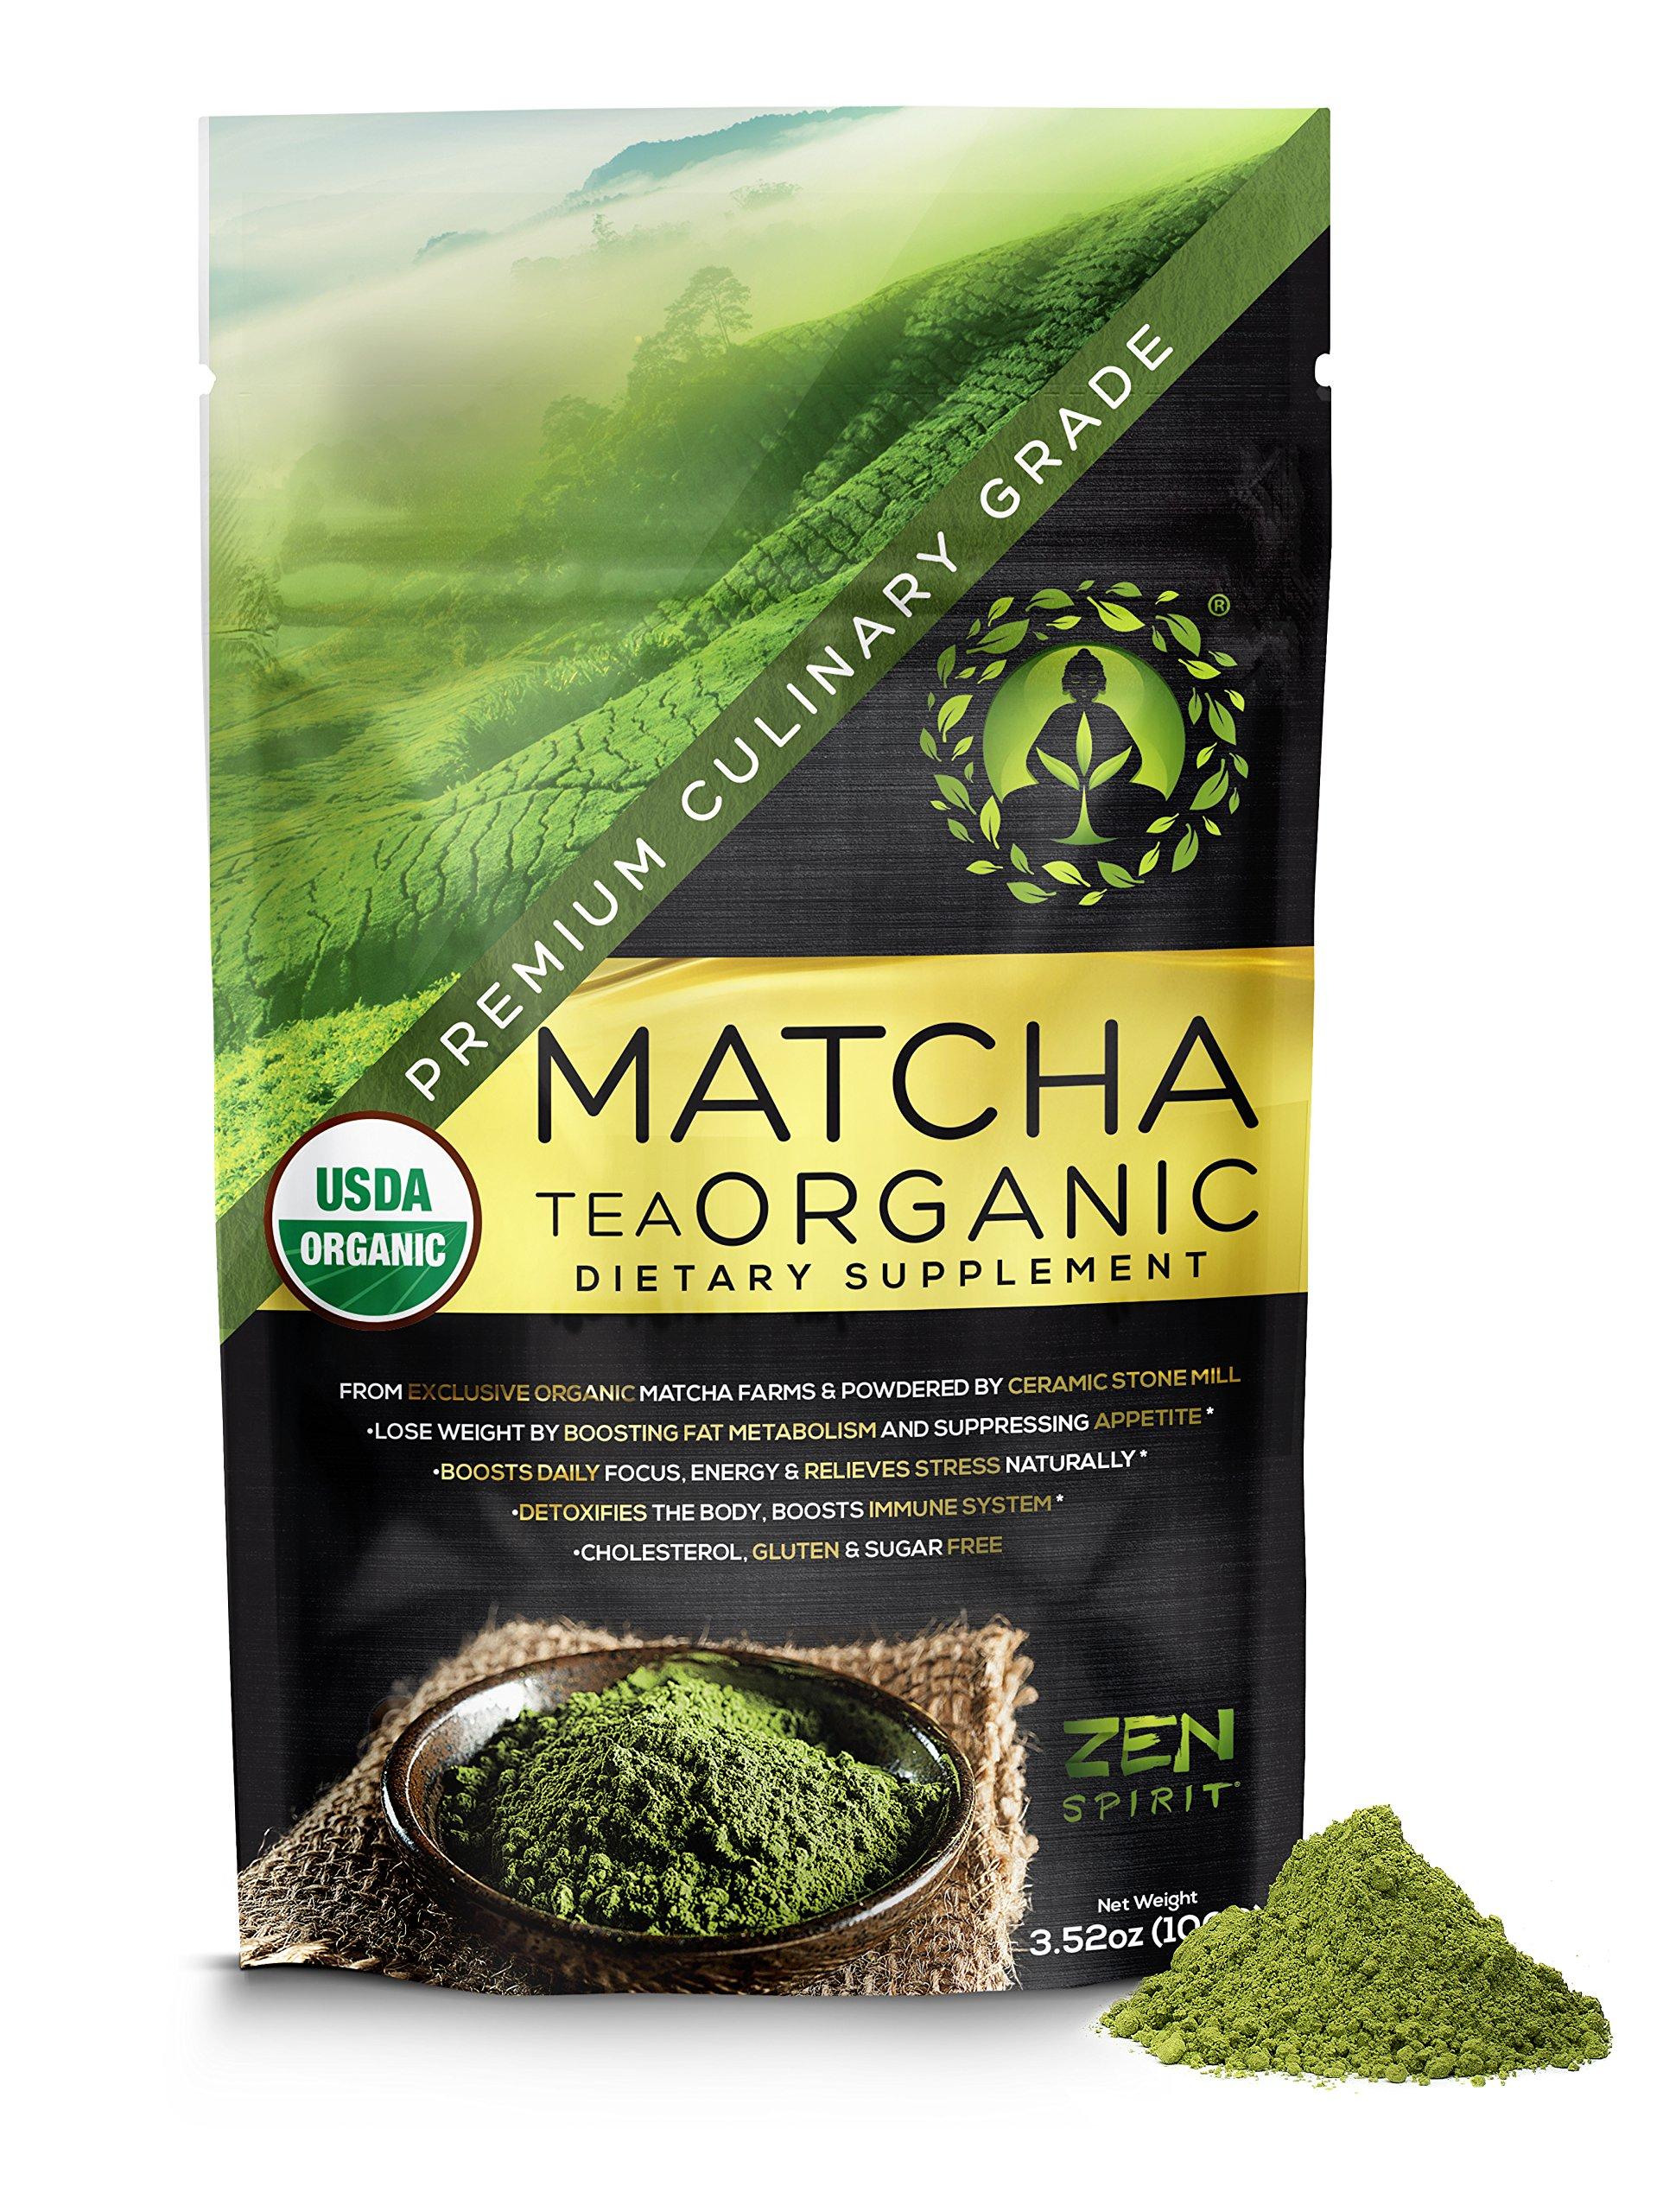 Matcha Green Tea Powder Organic - Japanese Premium Culinary Grade, Unsweetened & Sugar Free - USDA & Vegan Certified - 100g (3.52 oz) - Perfect for Baking, Smoothies, Latte, Iced tea & Weight Loss